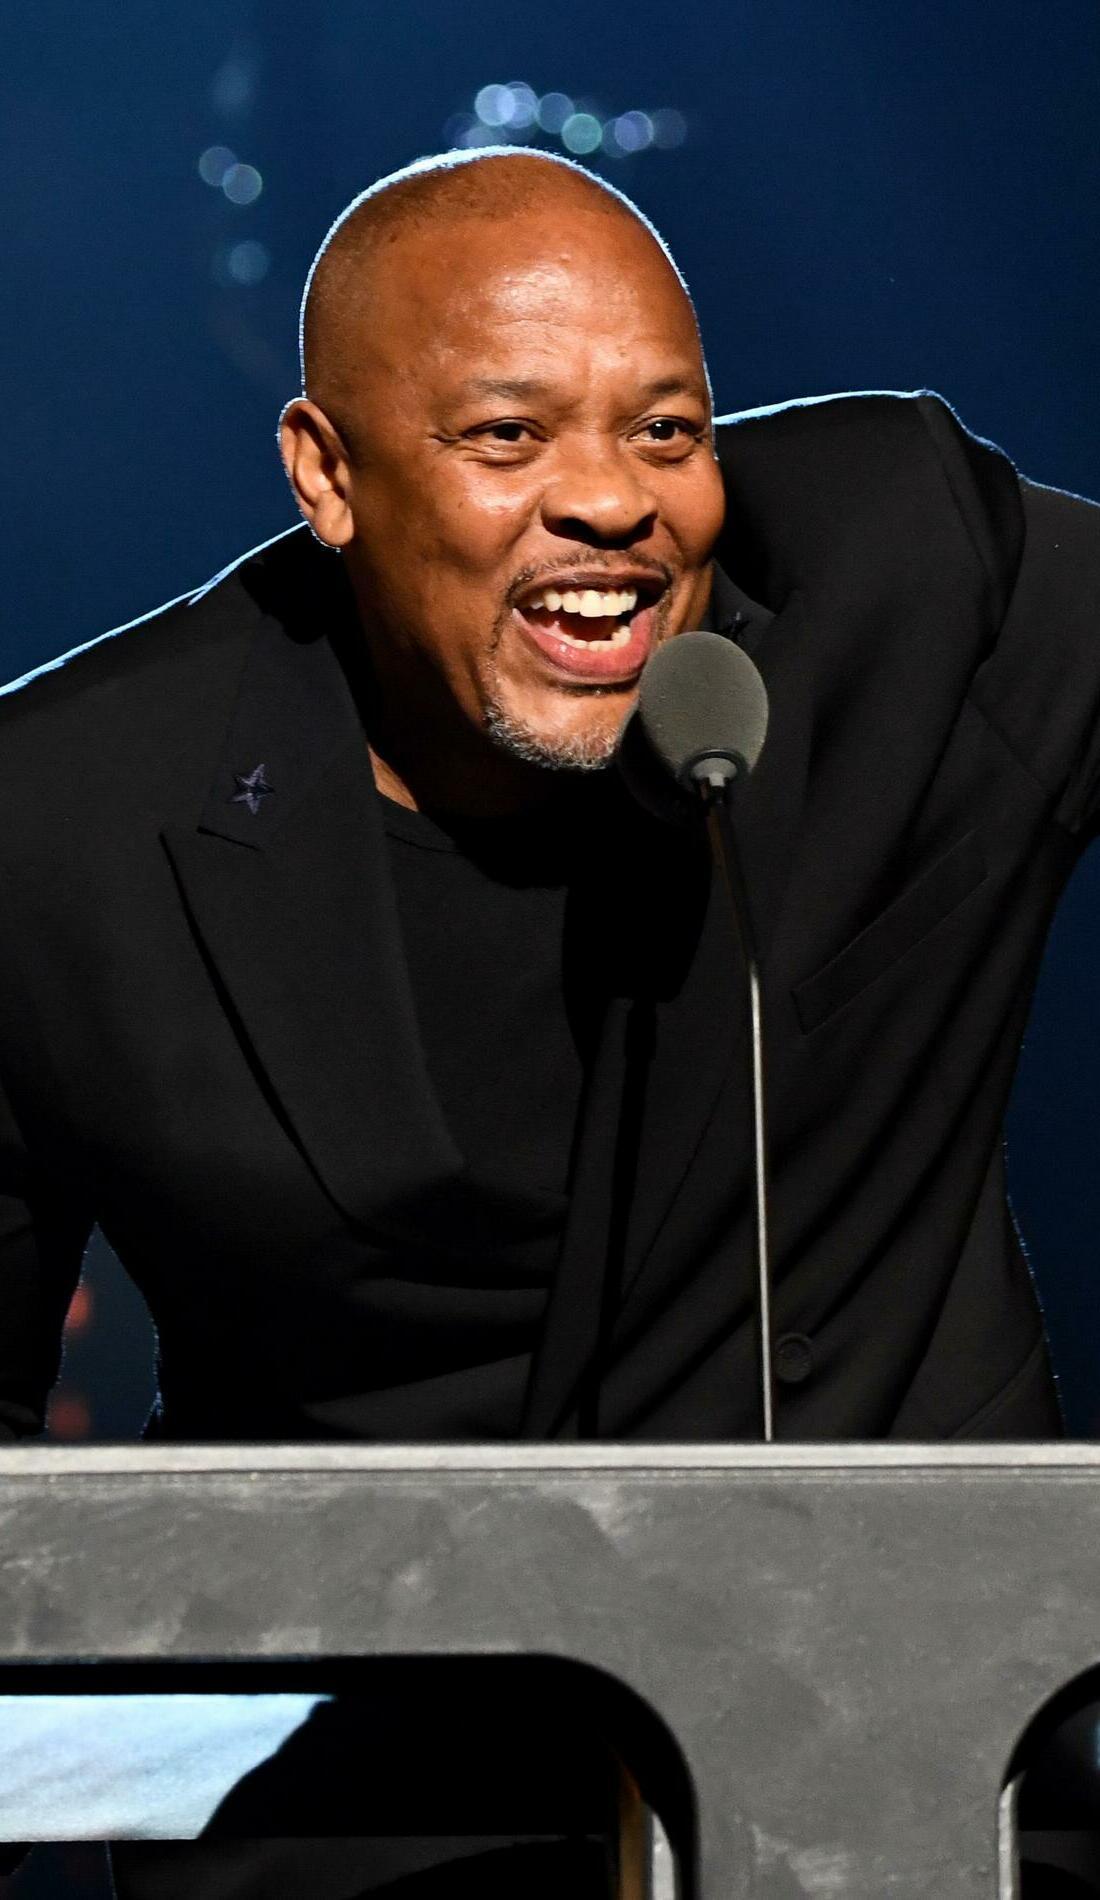 A Dr. Dre live event